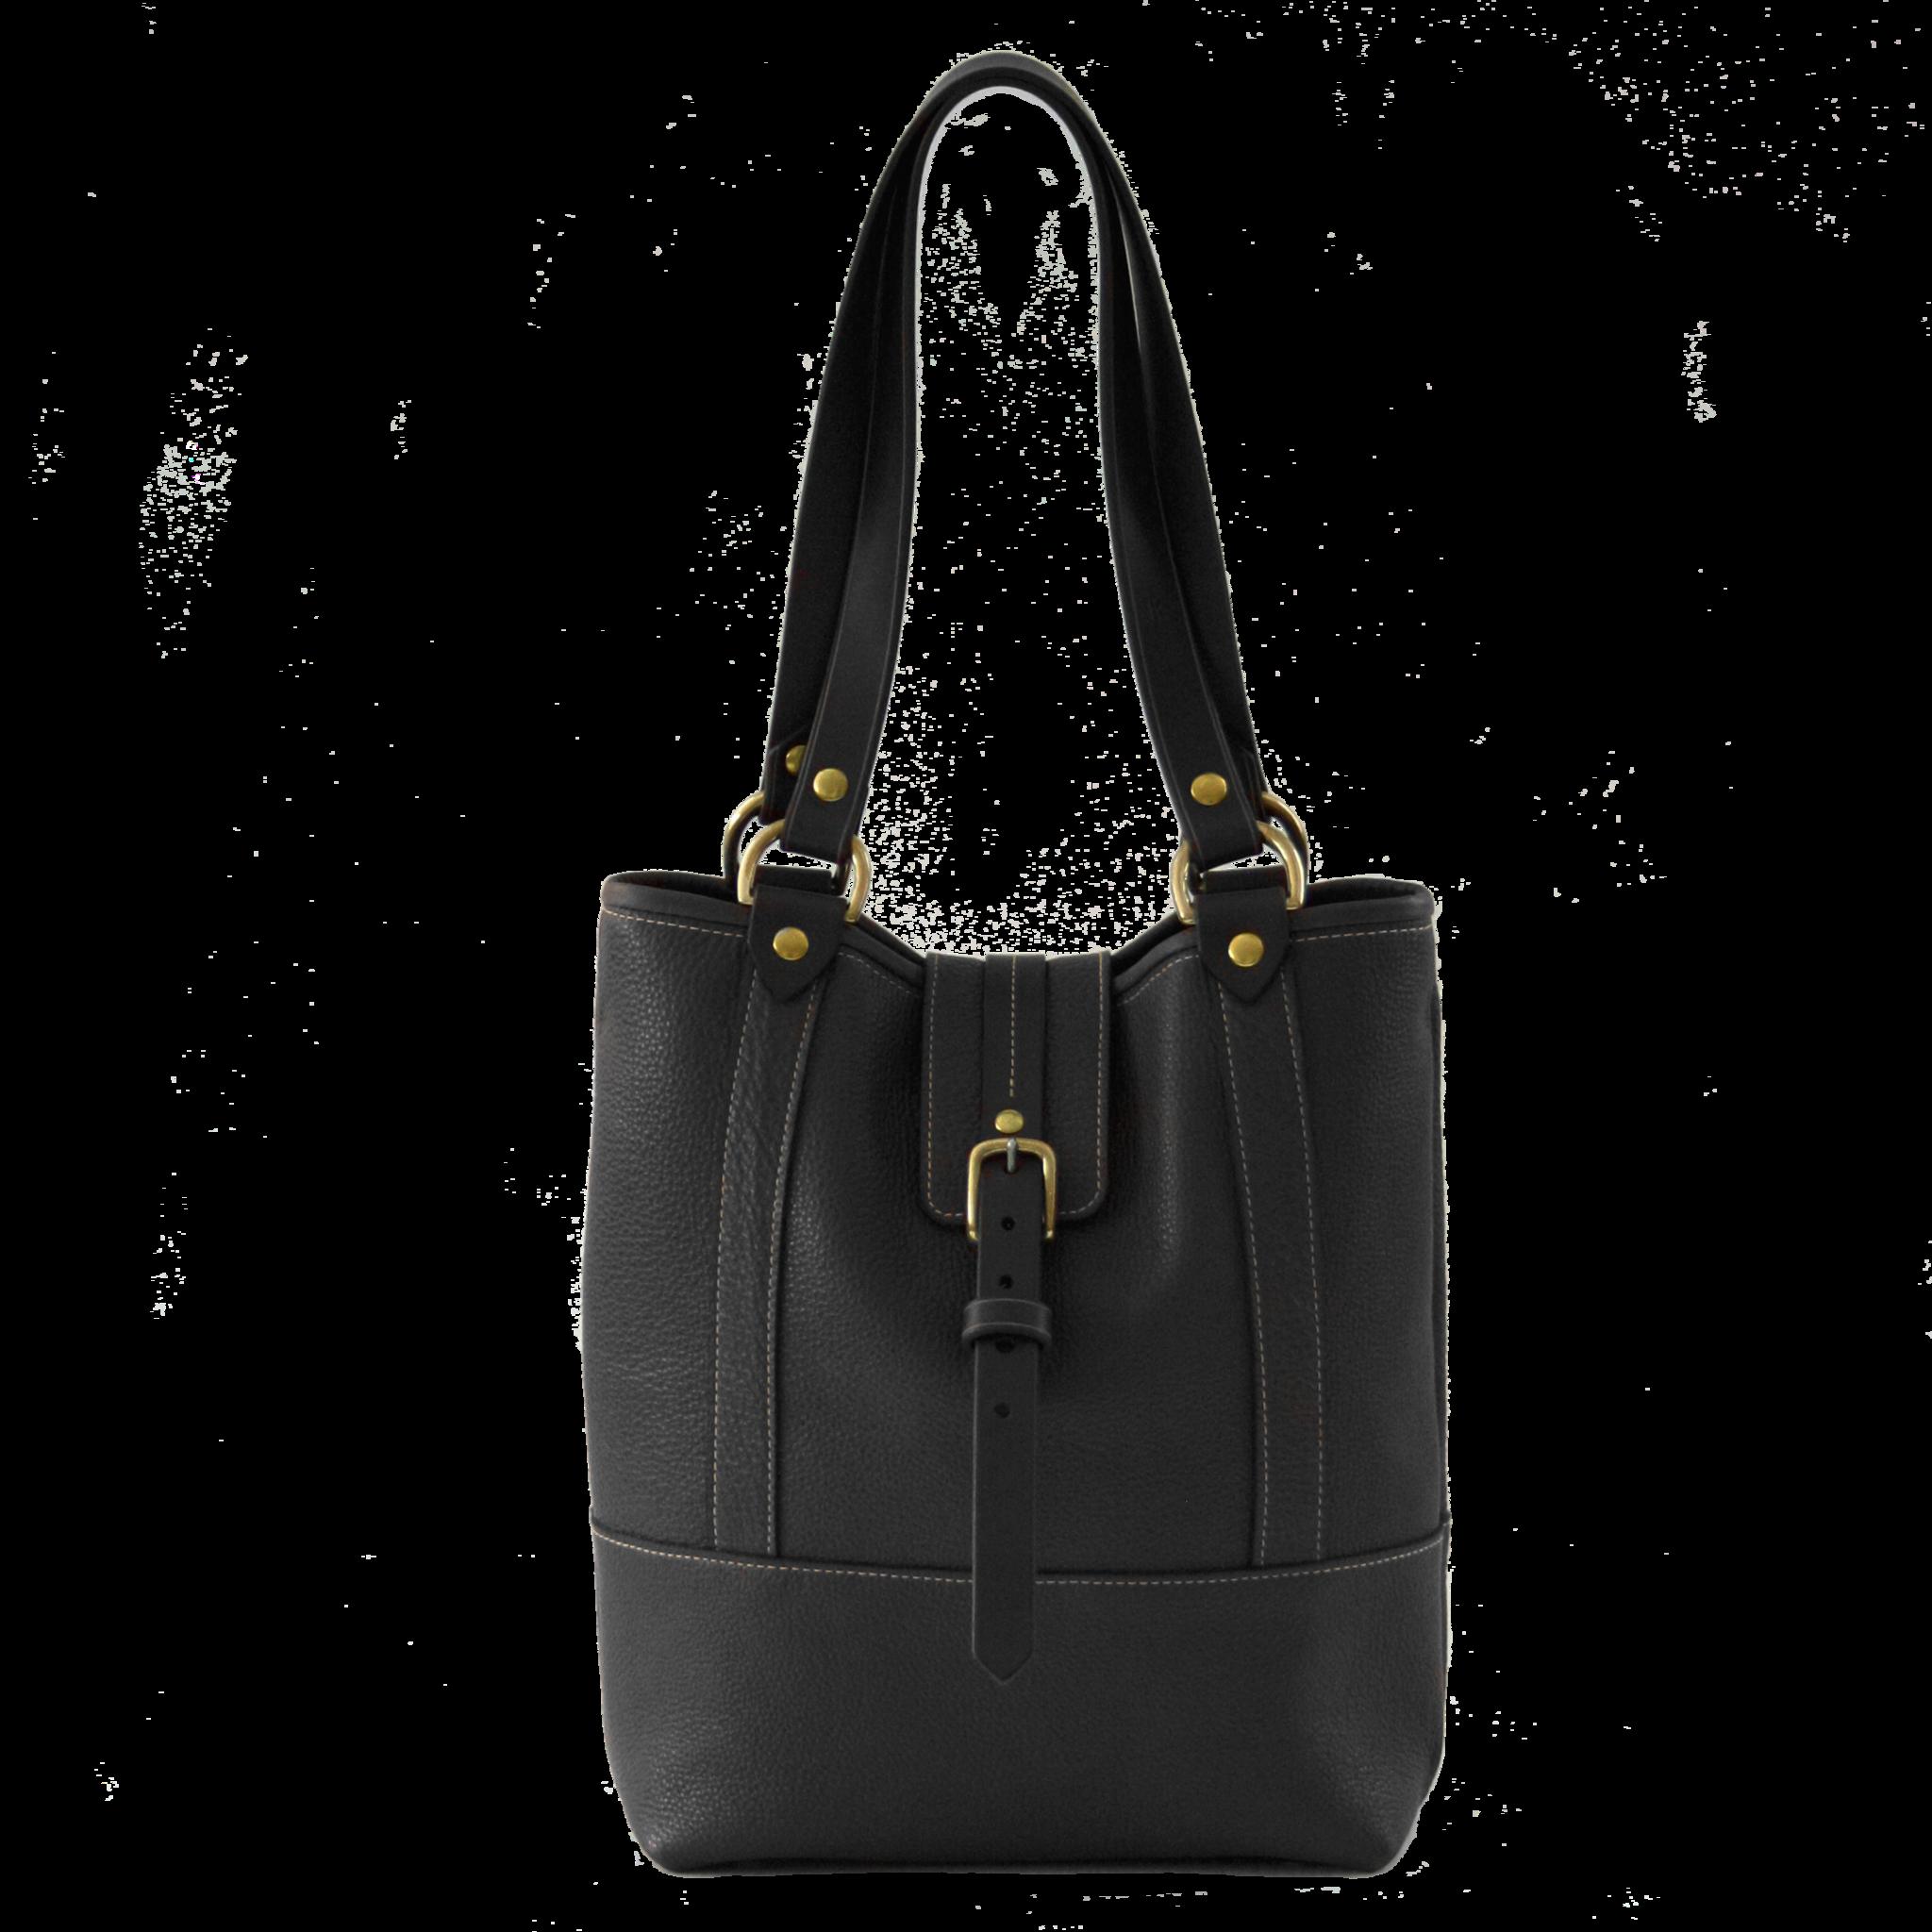 Sac de marché Stella from Kimberly Fletcher / bag